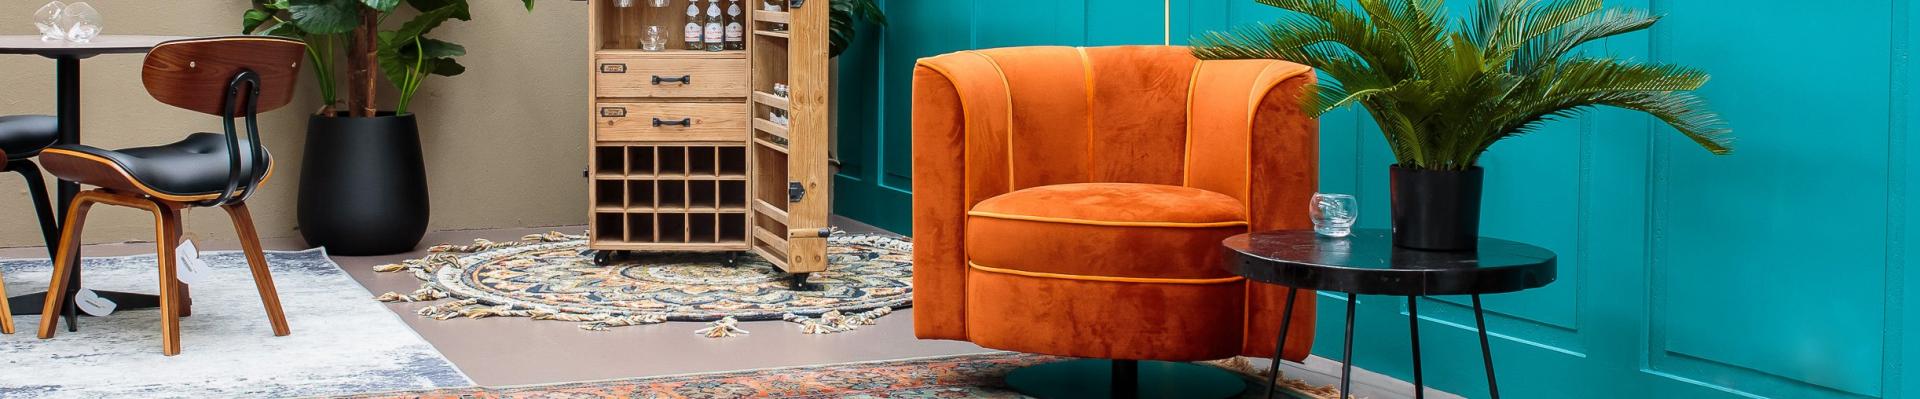 Dutchbone fauteuils